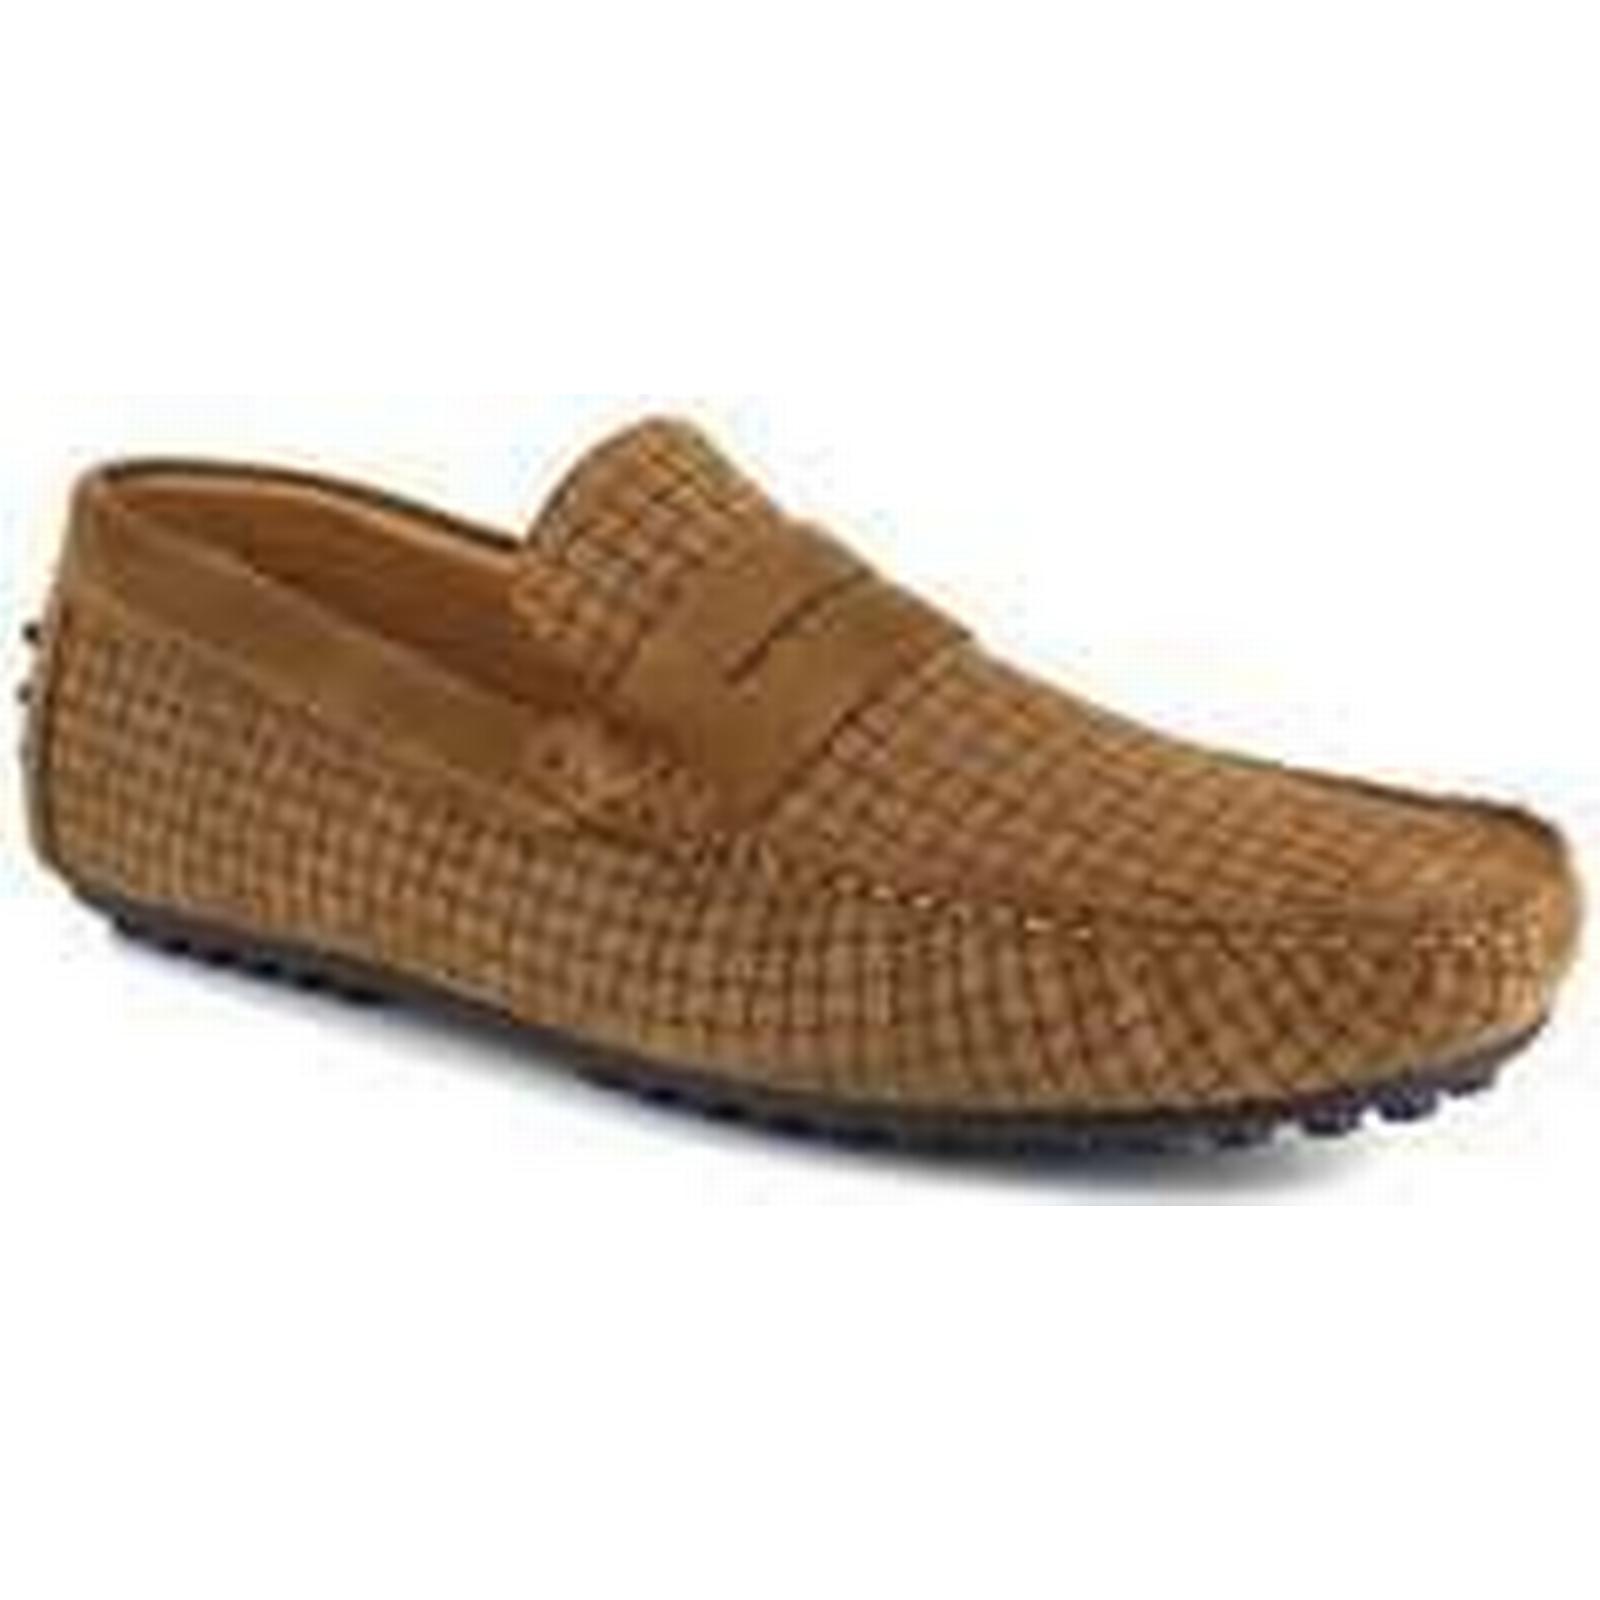 spartoo.co.uk j.bradford mocassin cognac cuir jb-sinagot hommes & # mocassins  ; s des mocassins # / chaussures tout aller à Marron  59acb8